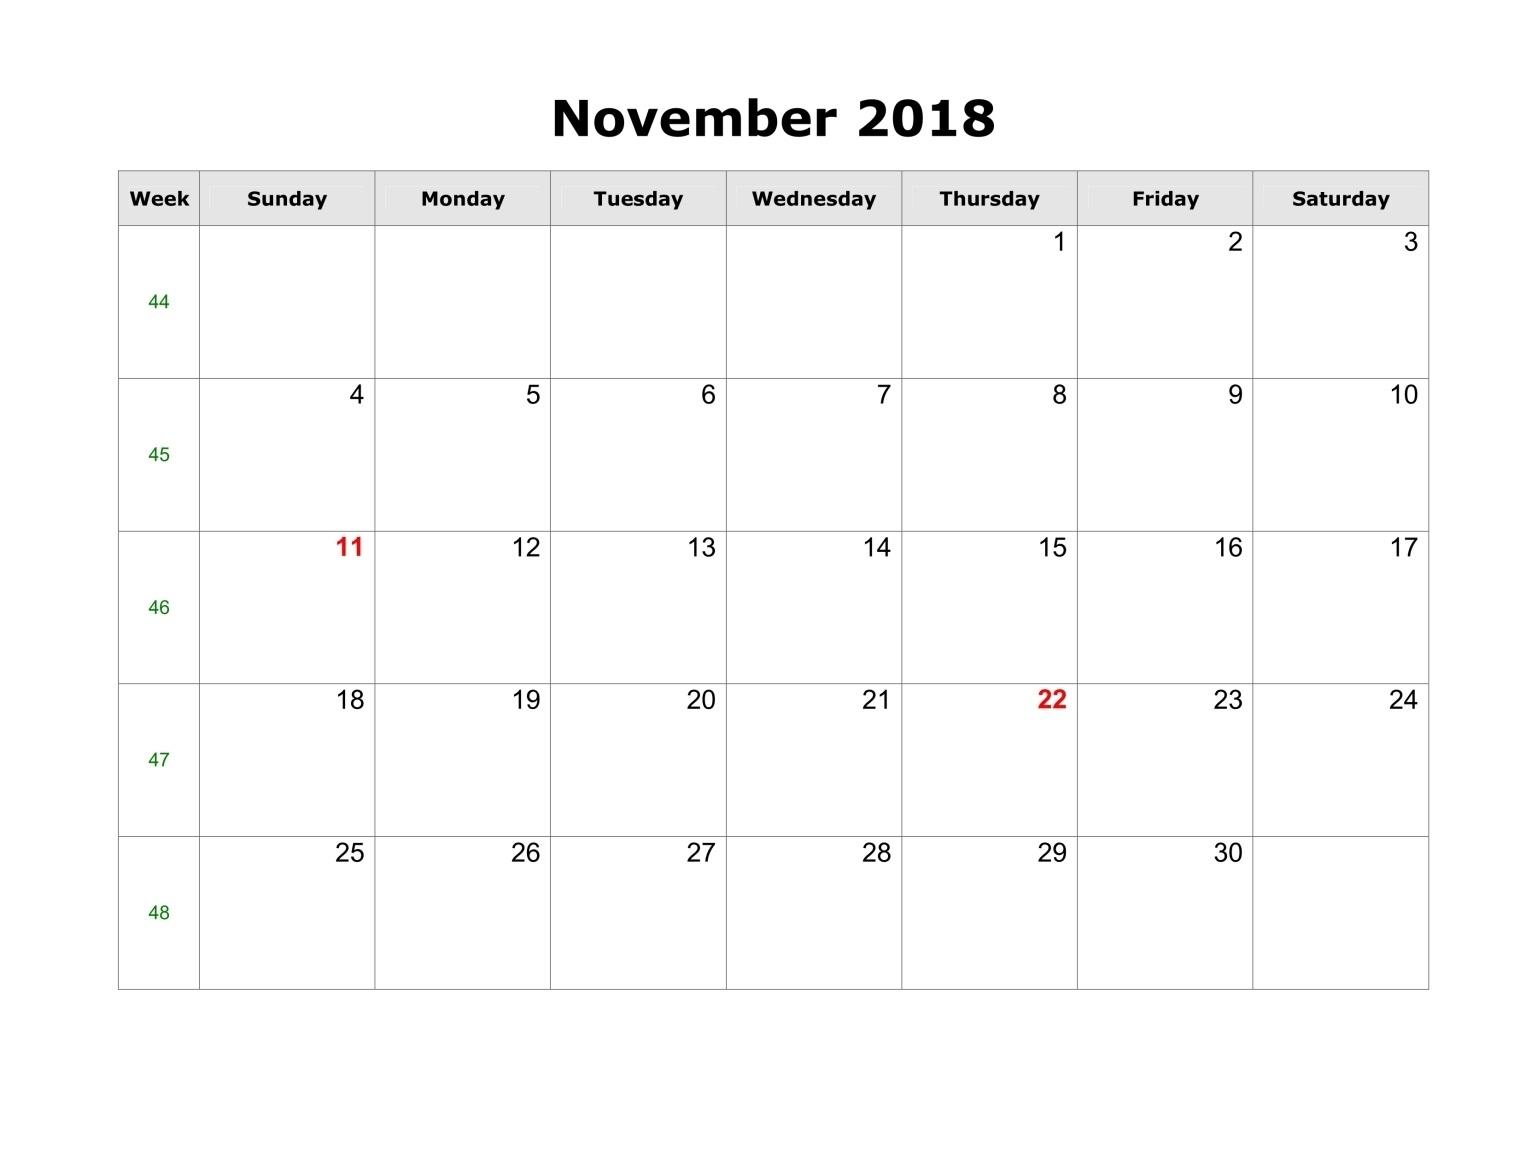 November 2018 Calendar Printable Blank Template